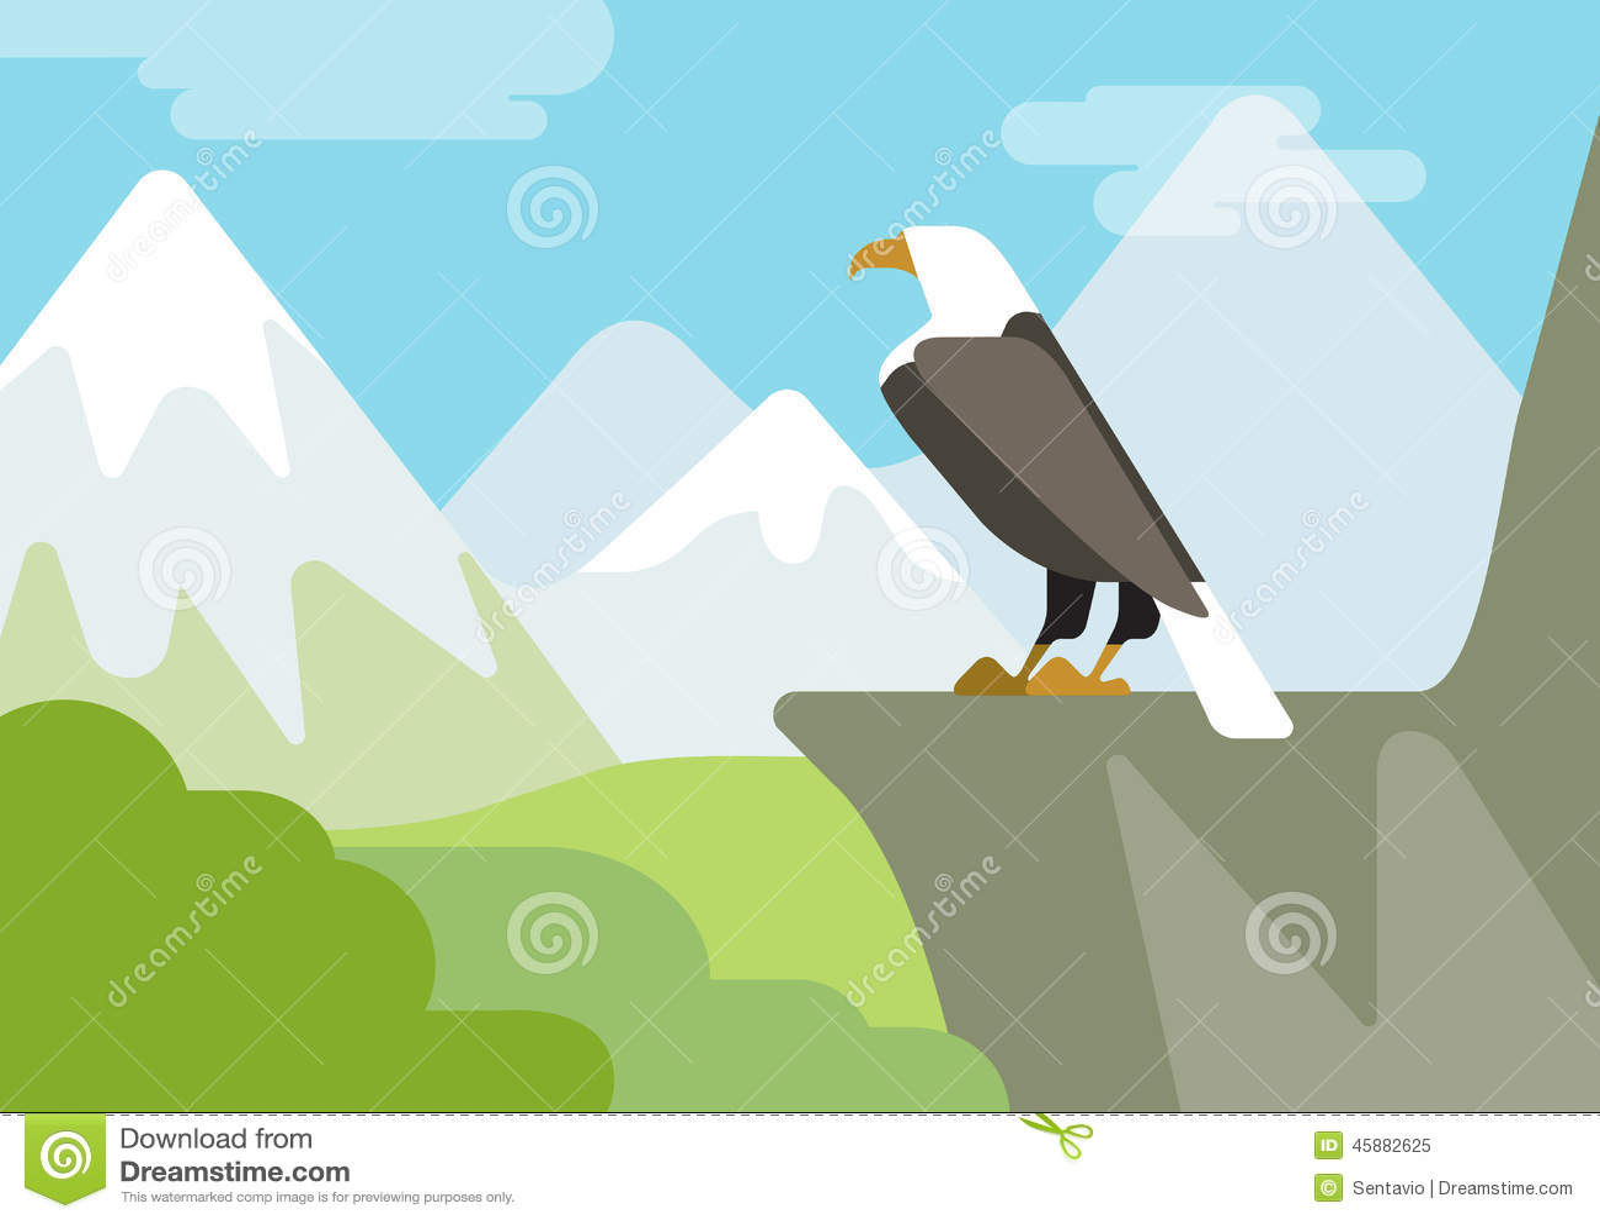 ... Cartoon Vector Wild Animals Birds Stock Vector - Image: 45882625